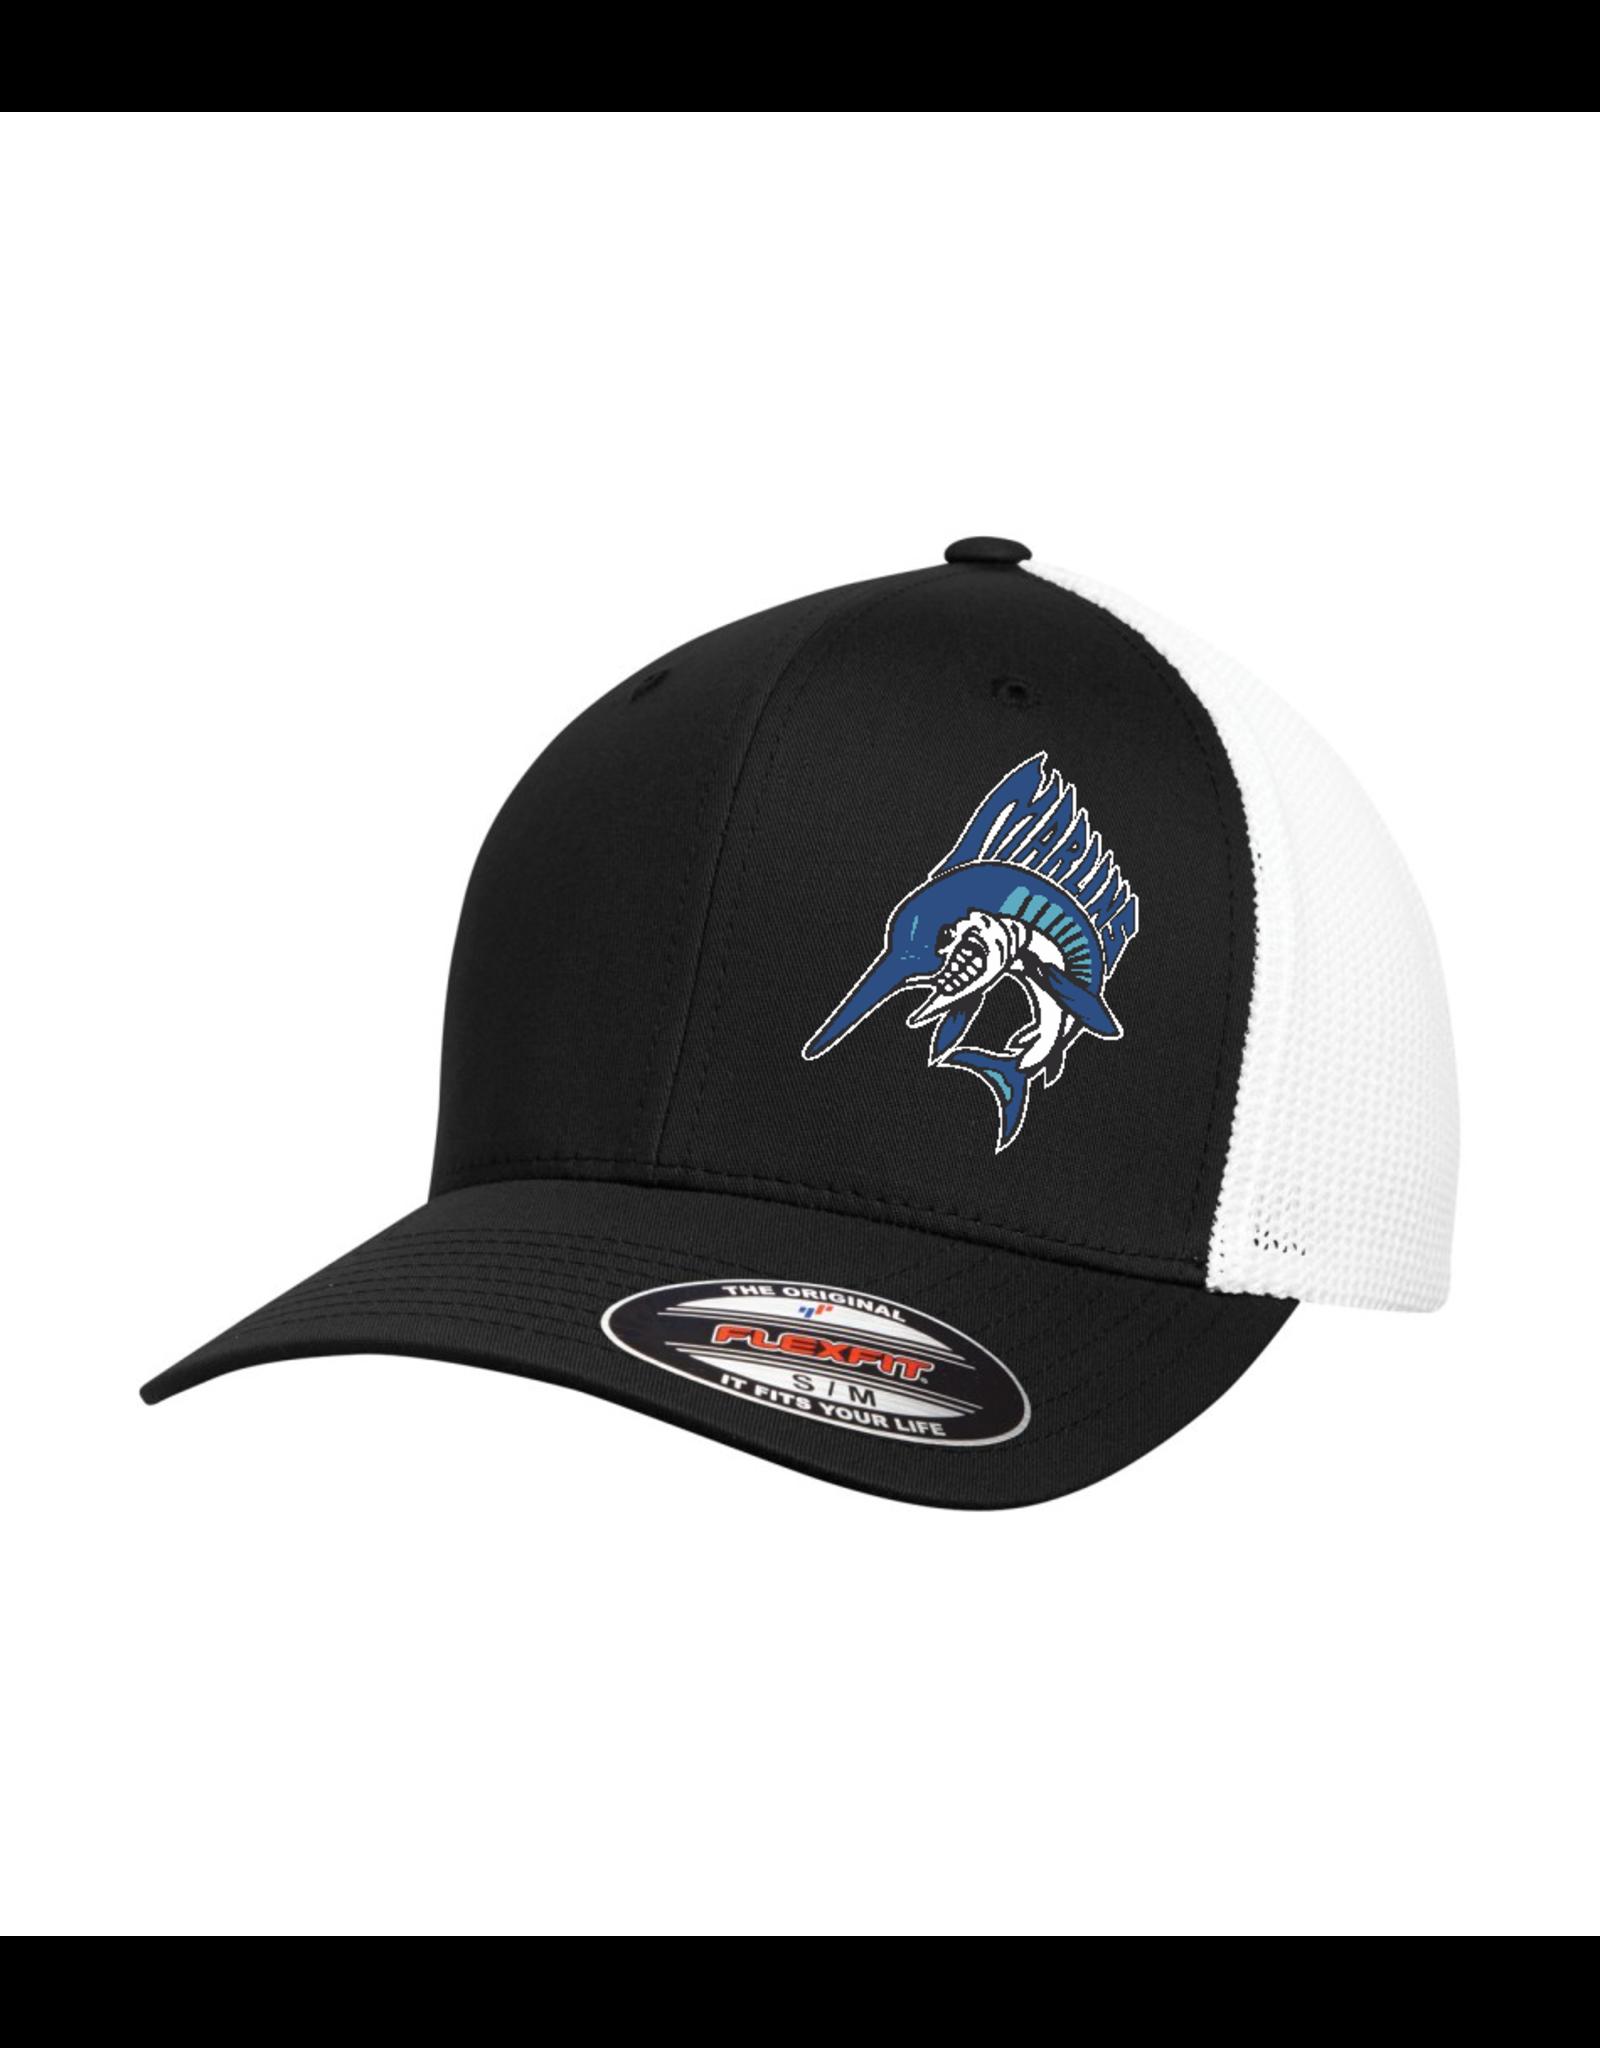 Marlins hat